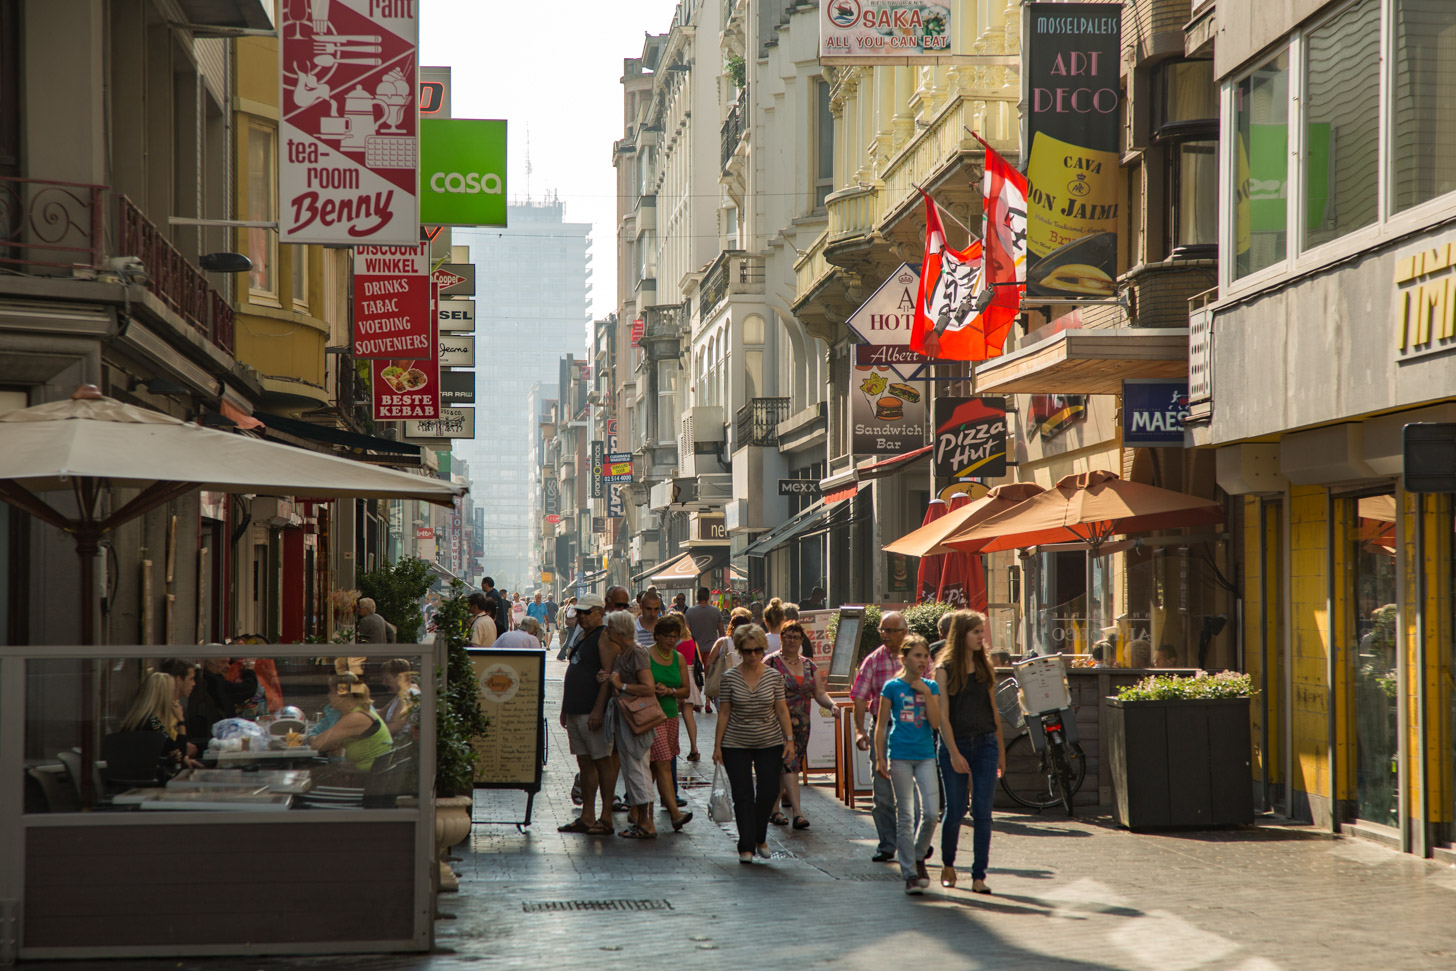 winkelen in Oostende